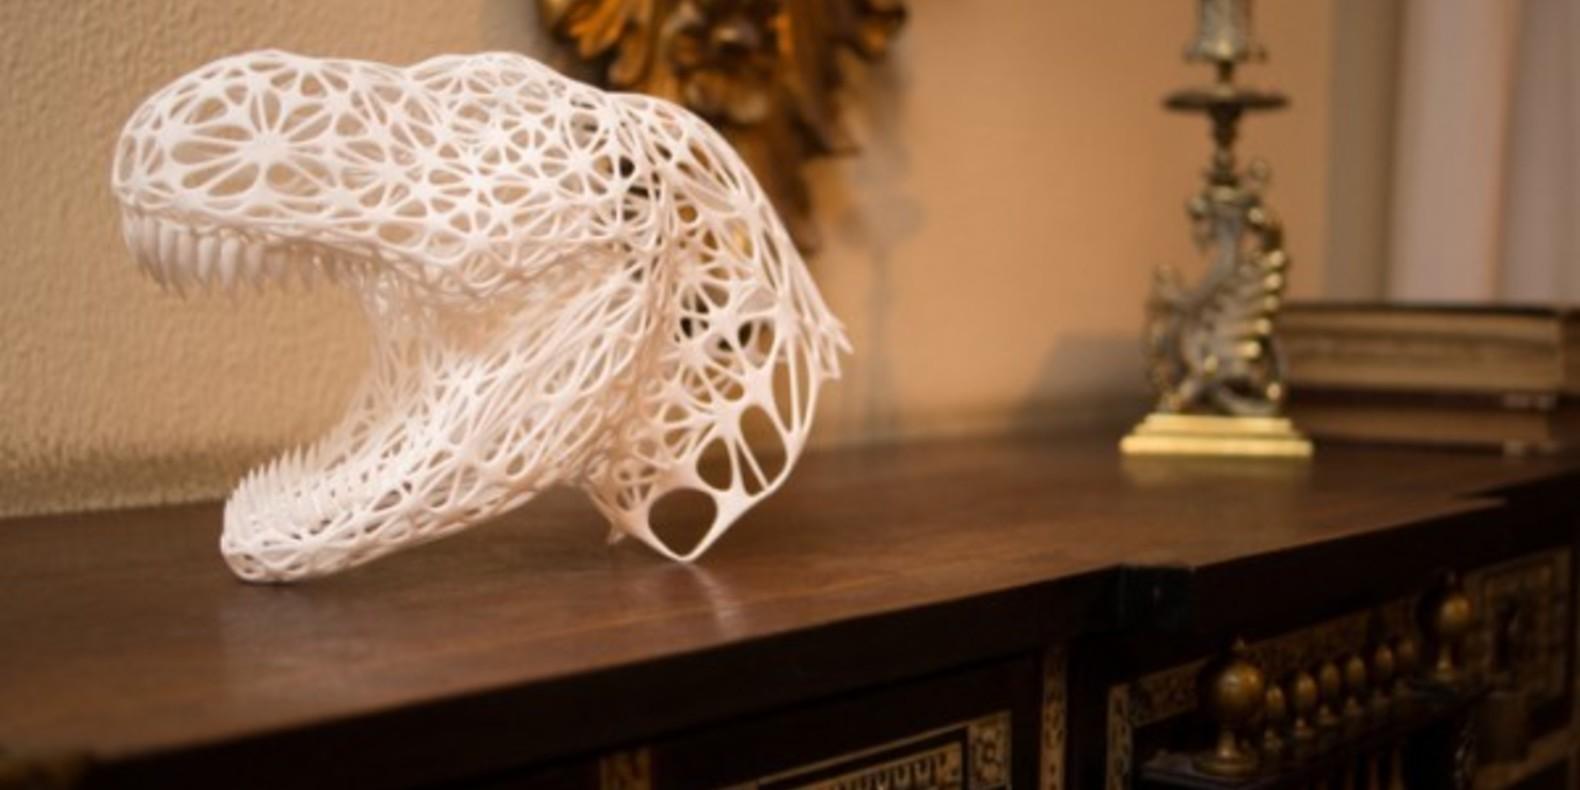 3D-REX, the Tyrannosaurus Rex printed in 3D